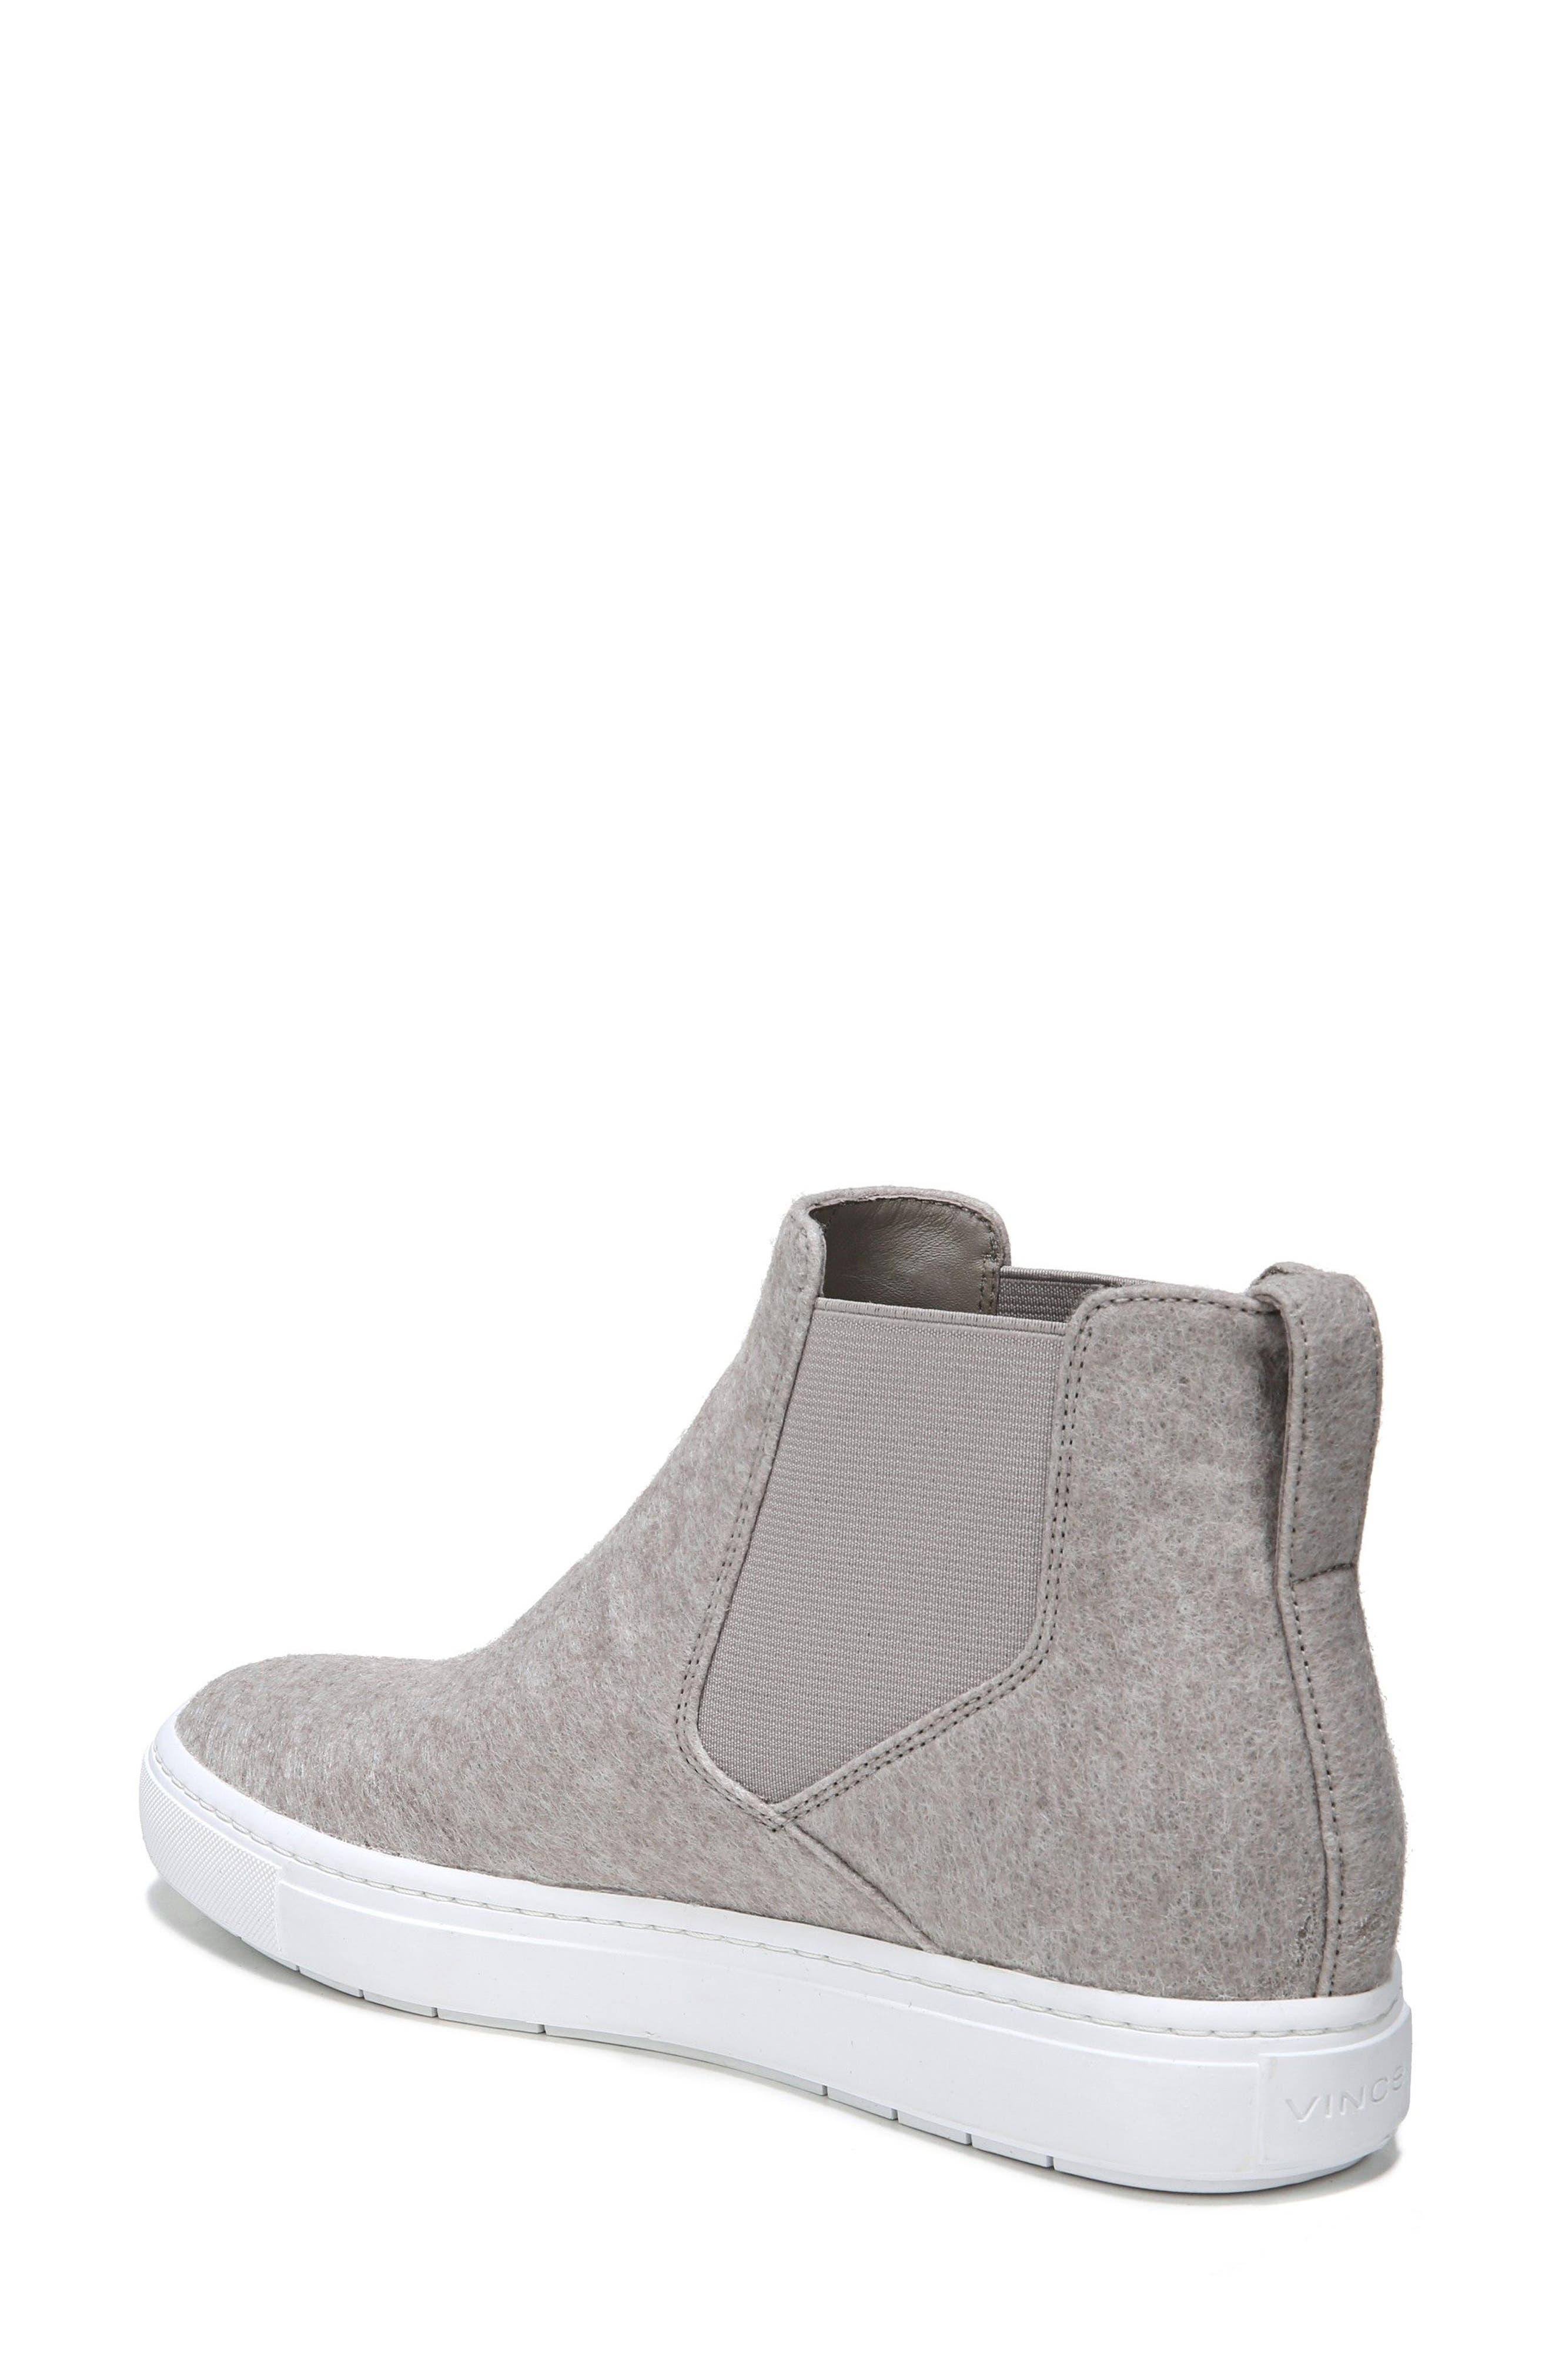 Newlyn High Top Sneaker,                             Alternate thumbnail 14, color,